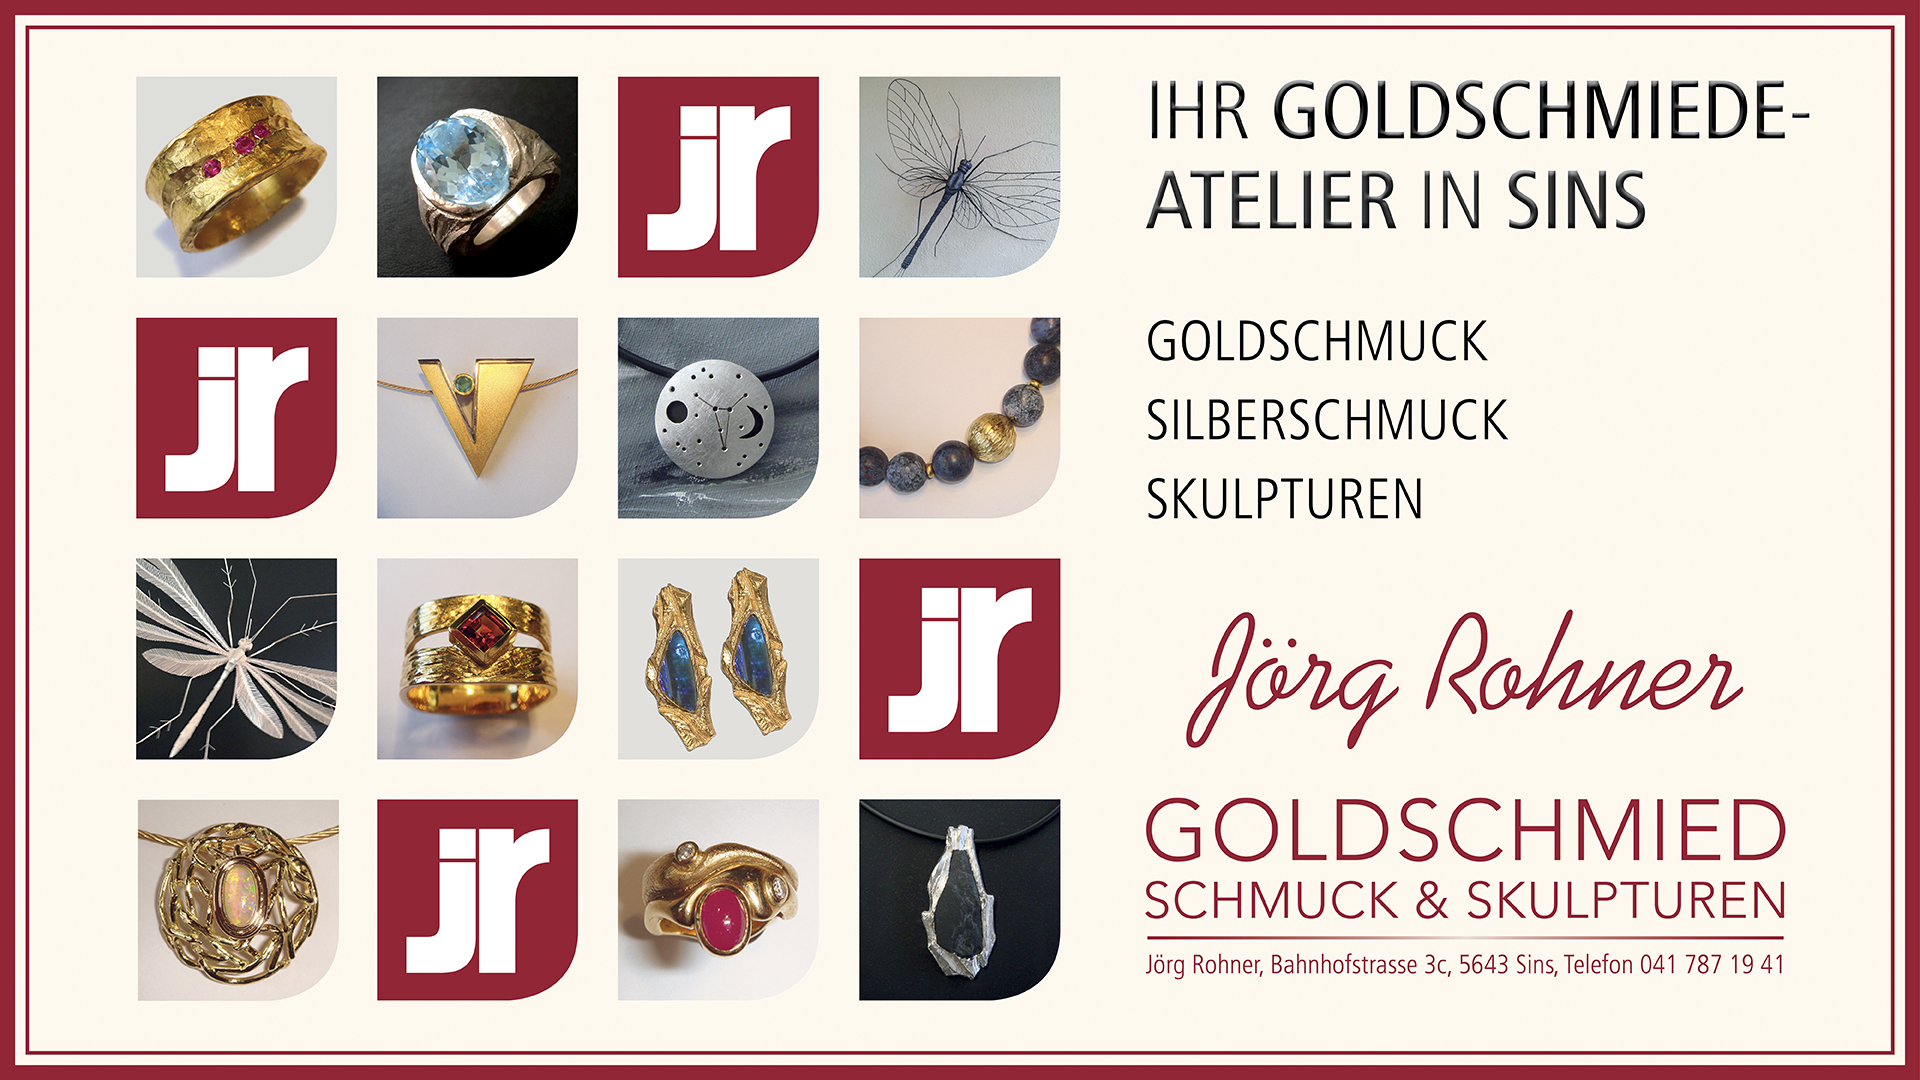 Jörg Rohner Goldschmied Sins